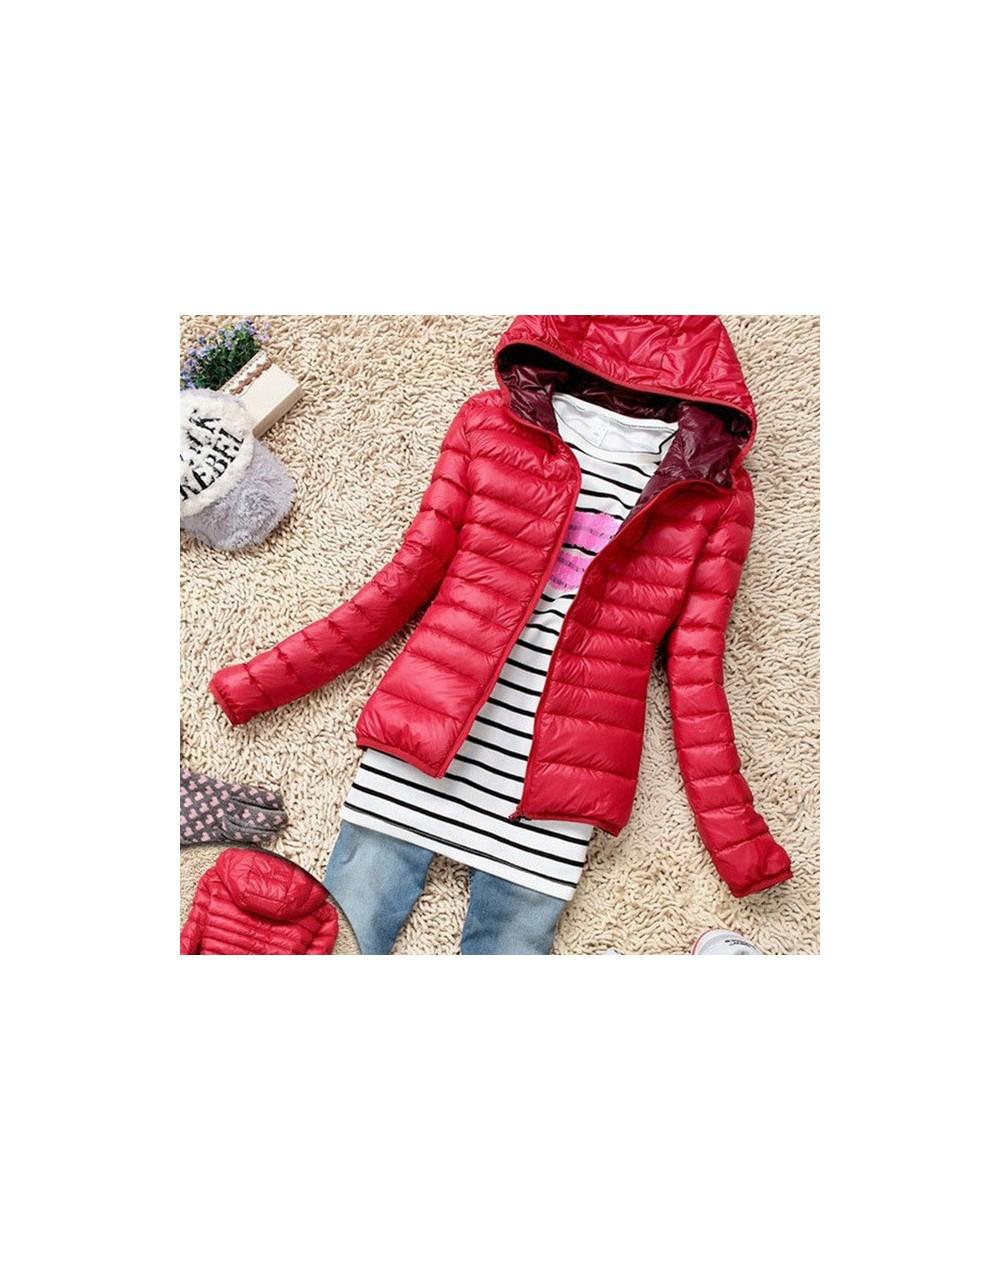 2019 Fashion Ladies Down Short Coat Winter Cotton-padded Jacket Women Slim Solid Zipper Outerwear jackets female hooded clot...